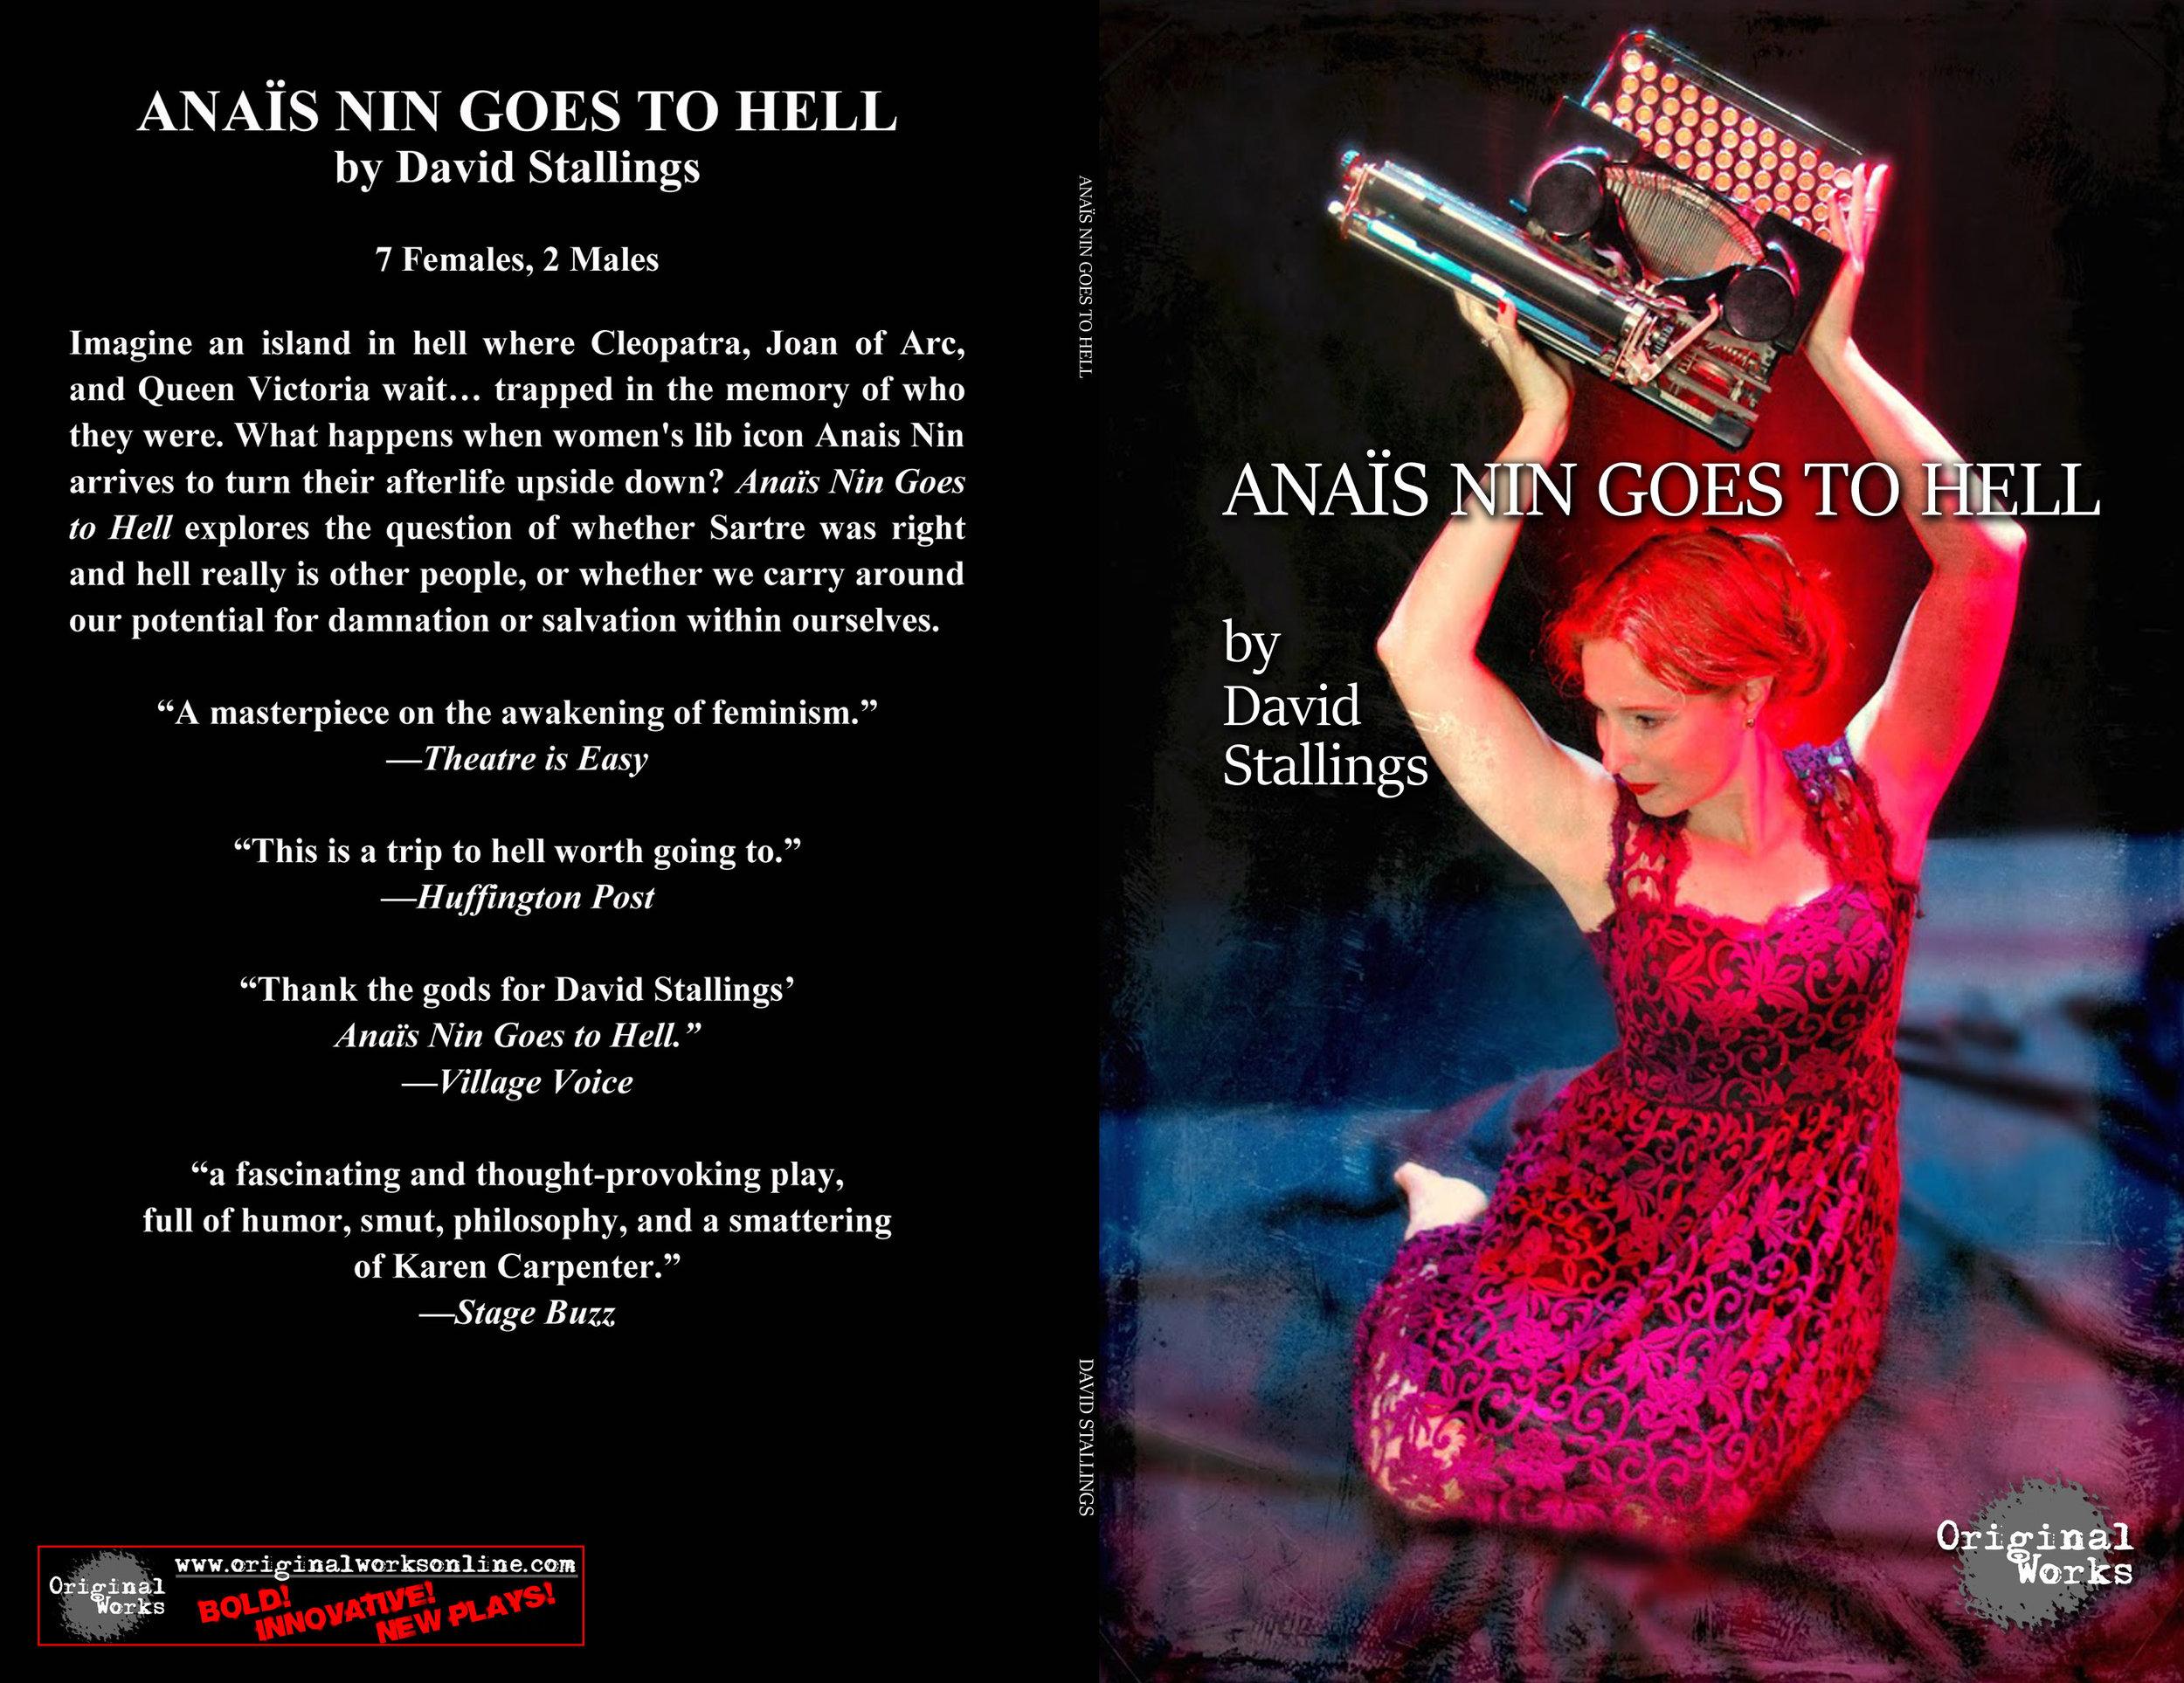 Anais Full Cover.jpg